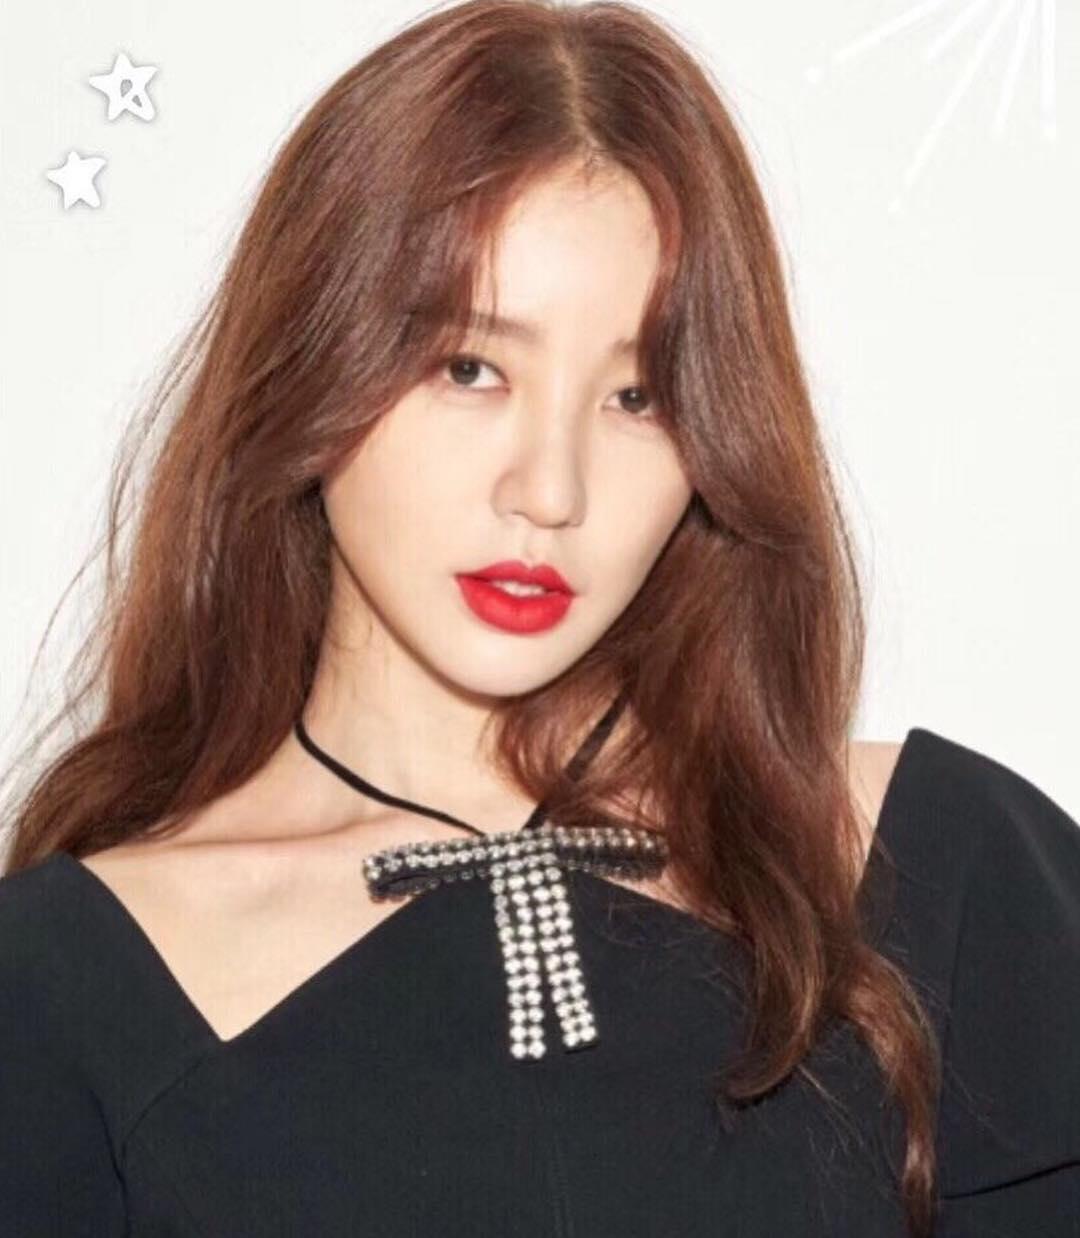 Hallyu Yoon Eun Hye on Twitter: Yoon Eun Hye dress info